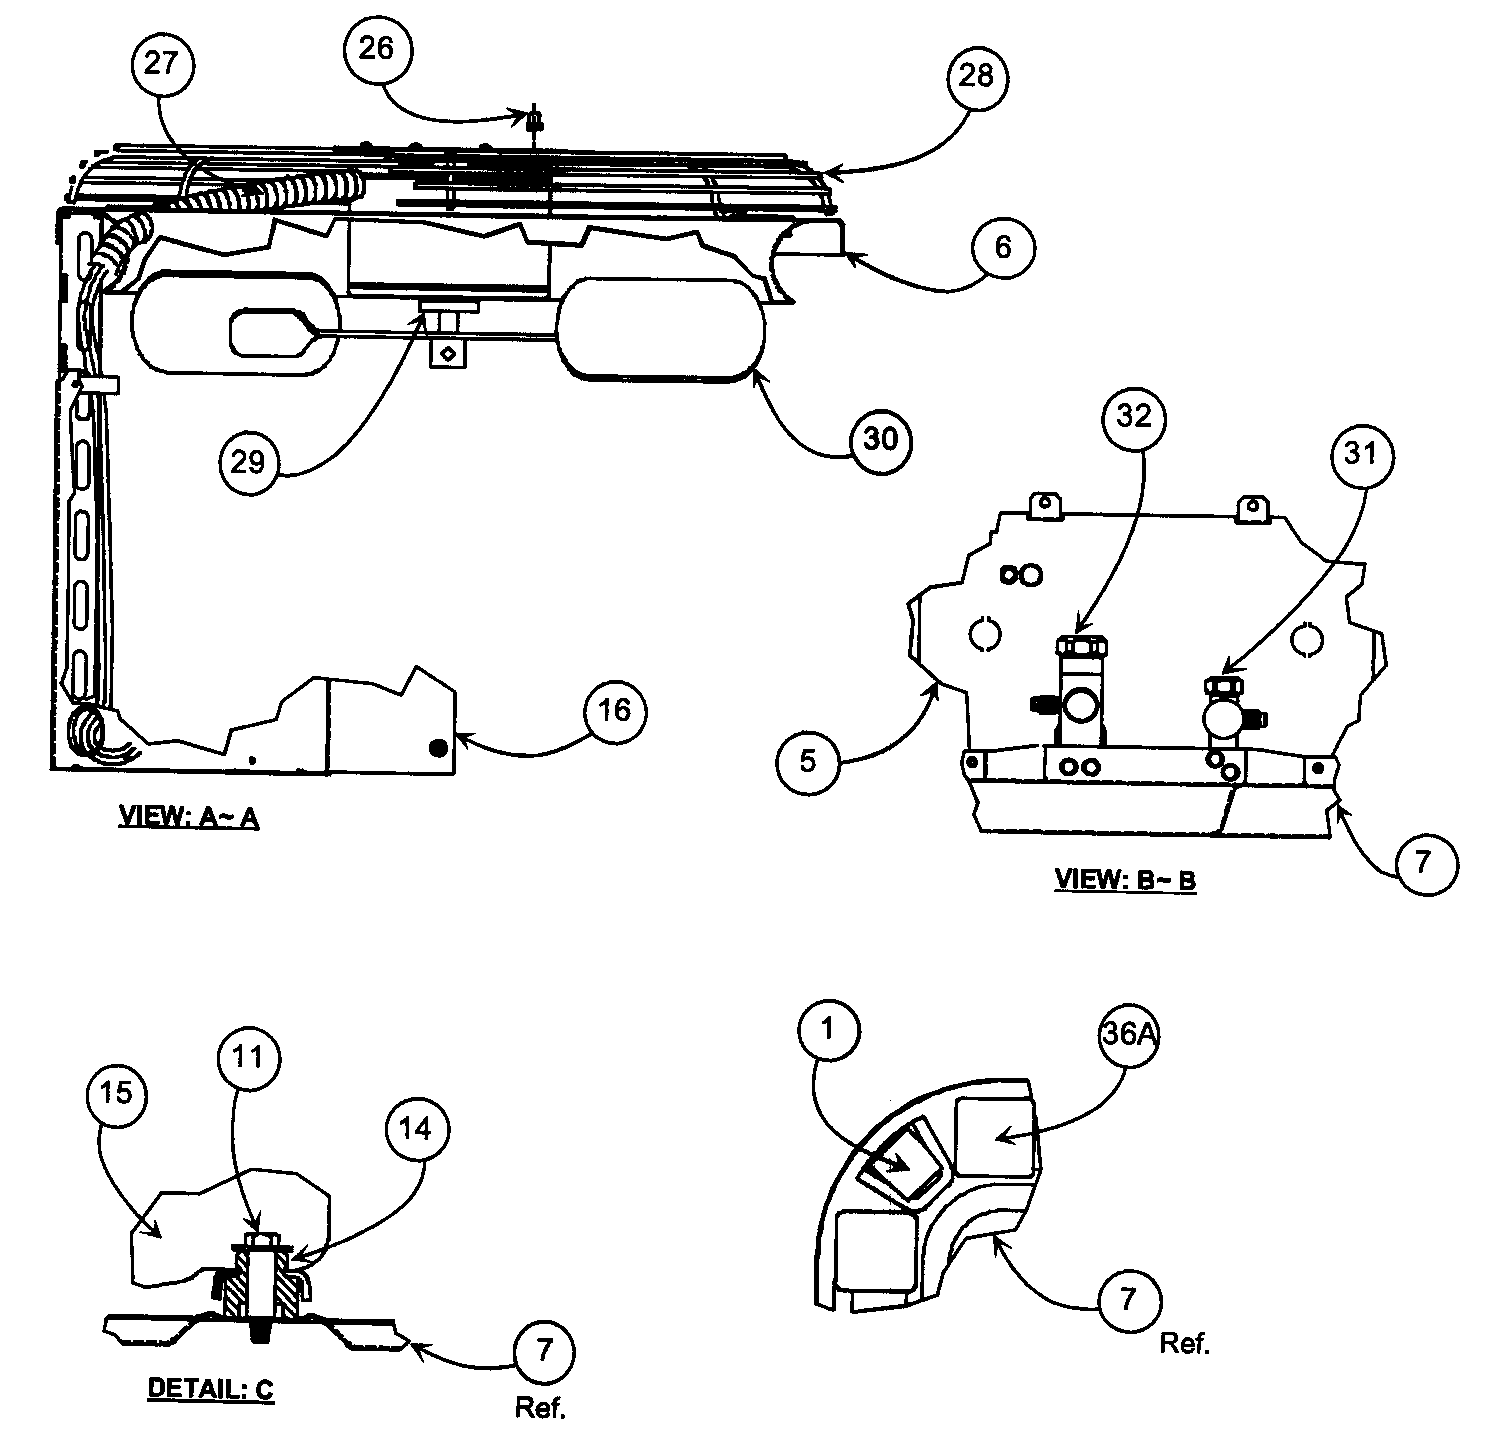 Payne model PA13NR03000GAAAA air-conditioner/heat pump